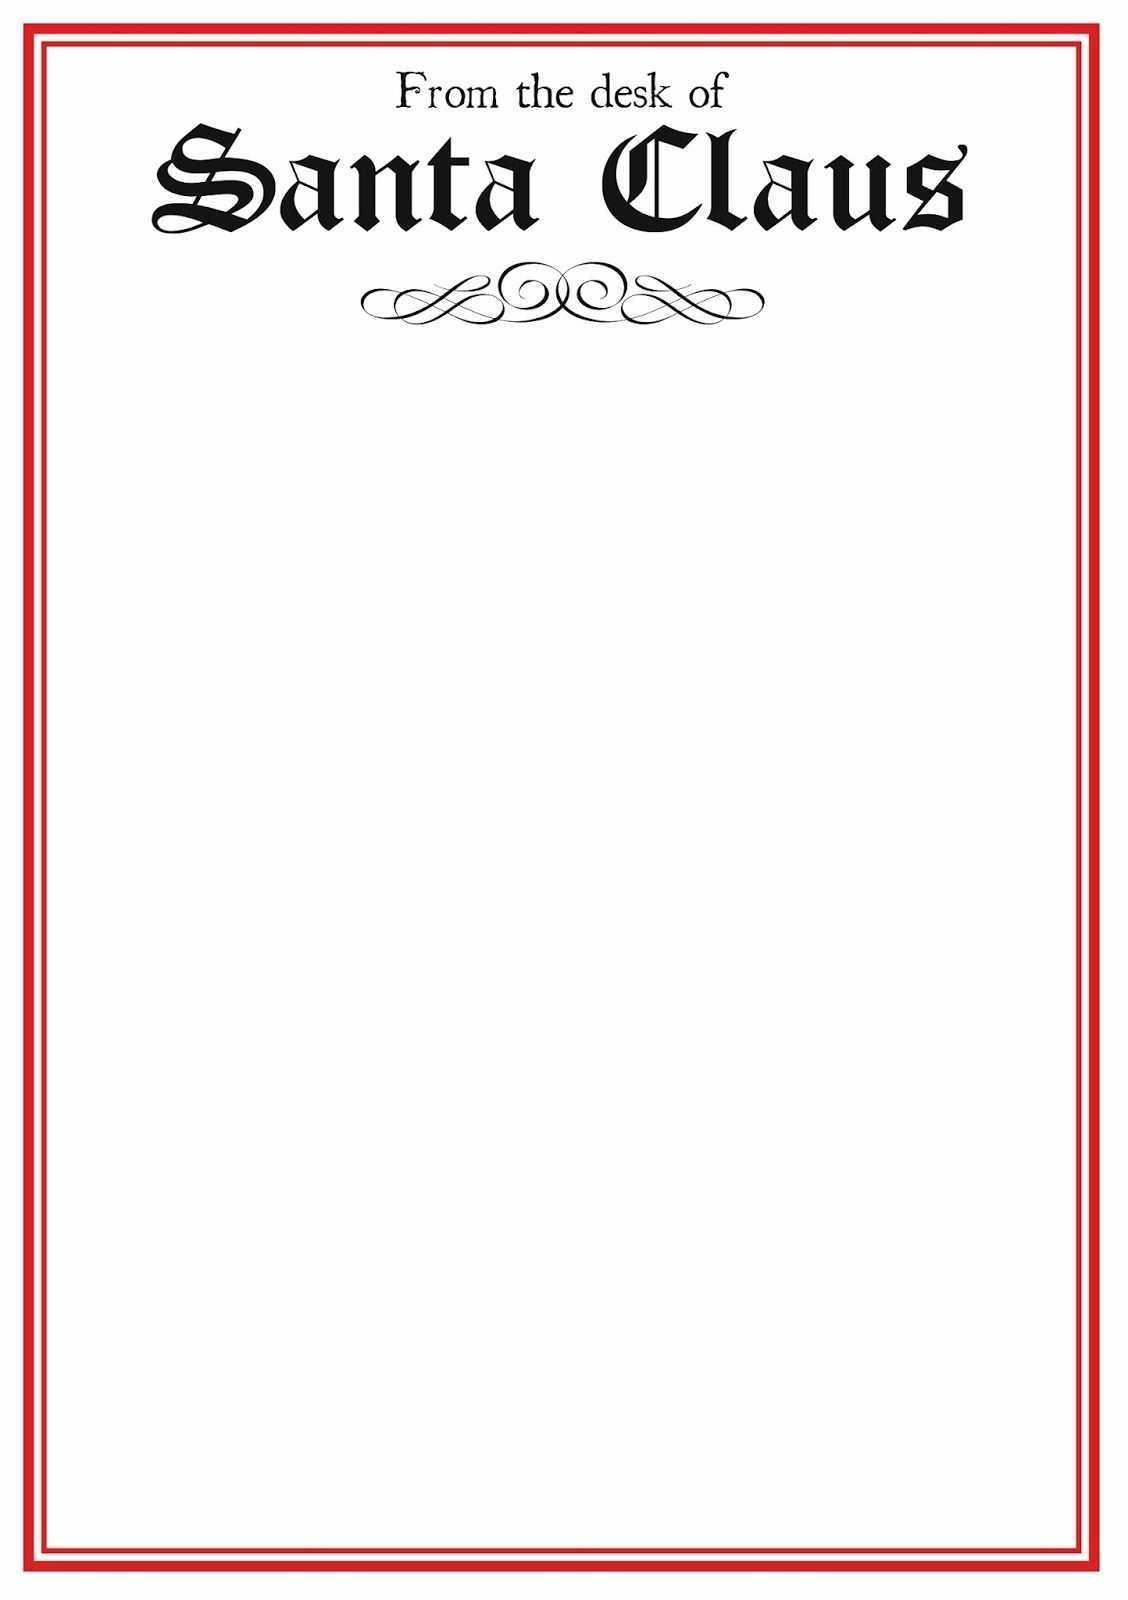 004 Template Ideas Blank Letter From Santa Pdf Cool To Inside Blank Letter From Santa Template